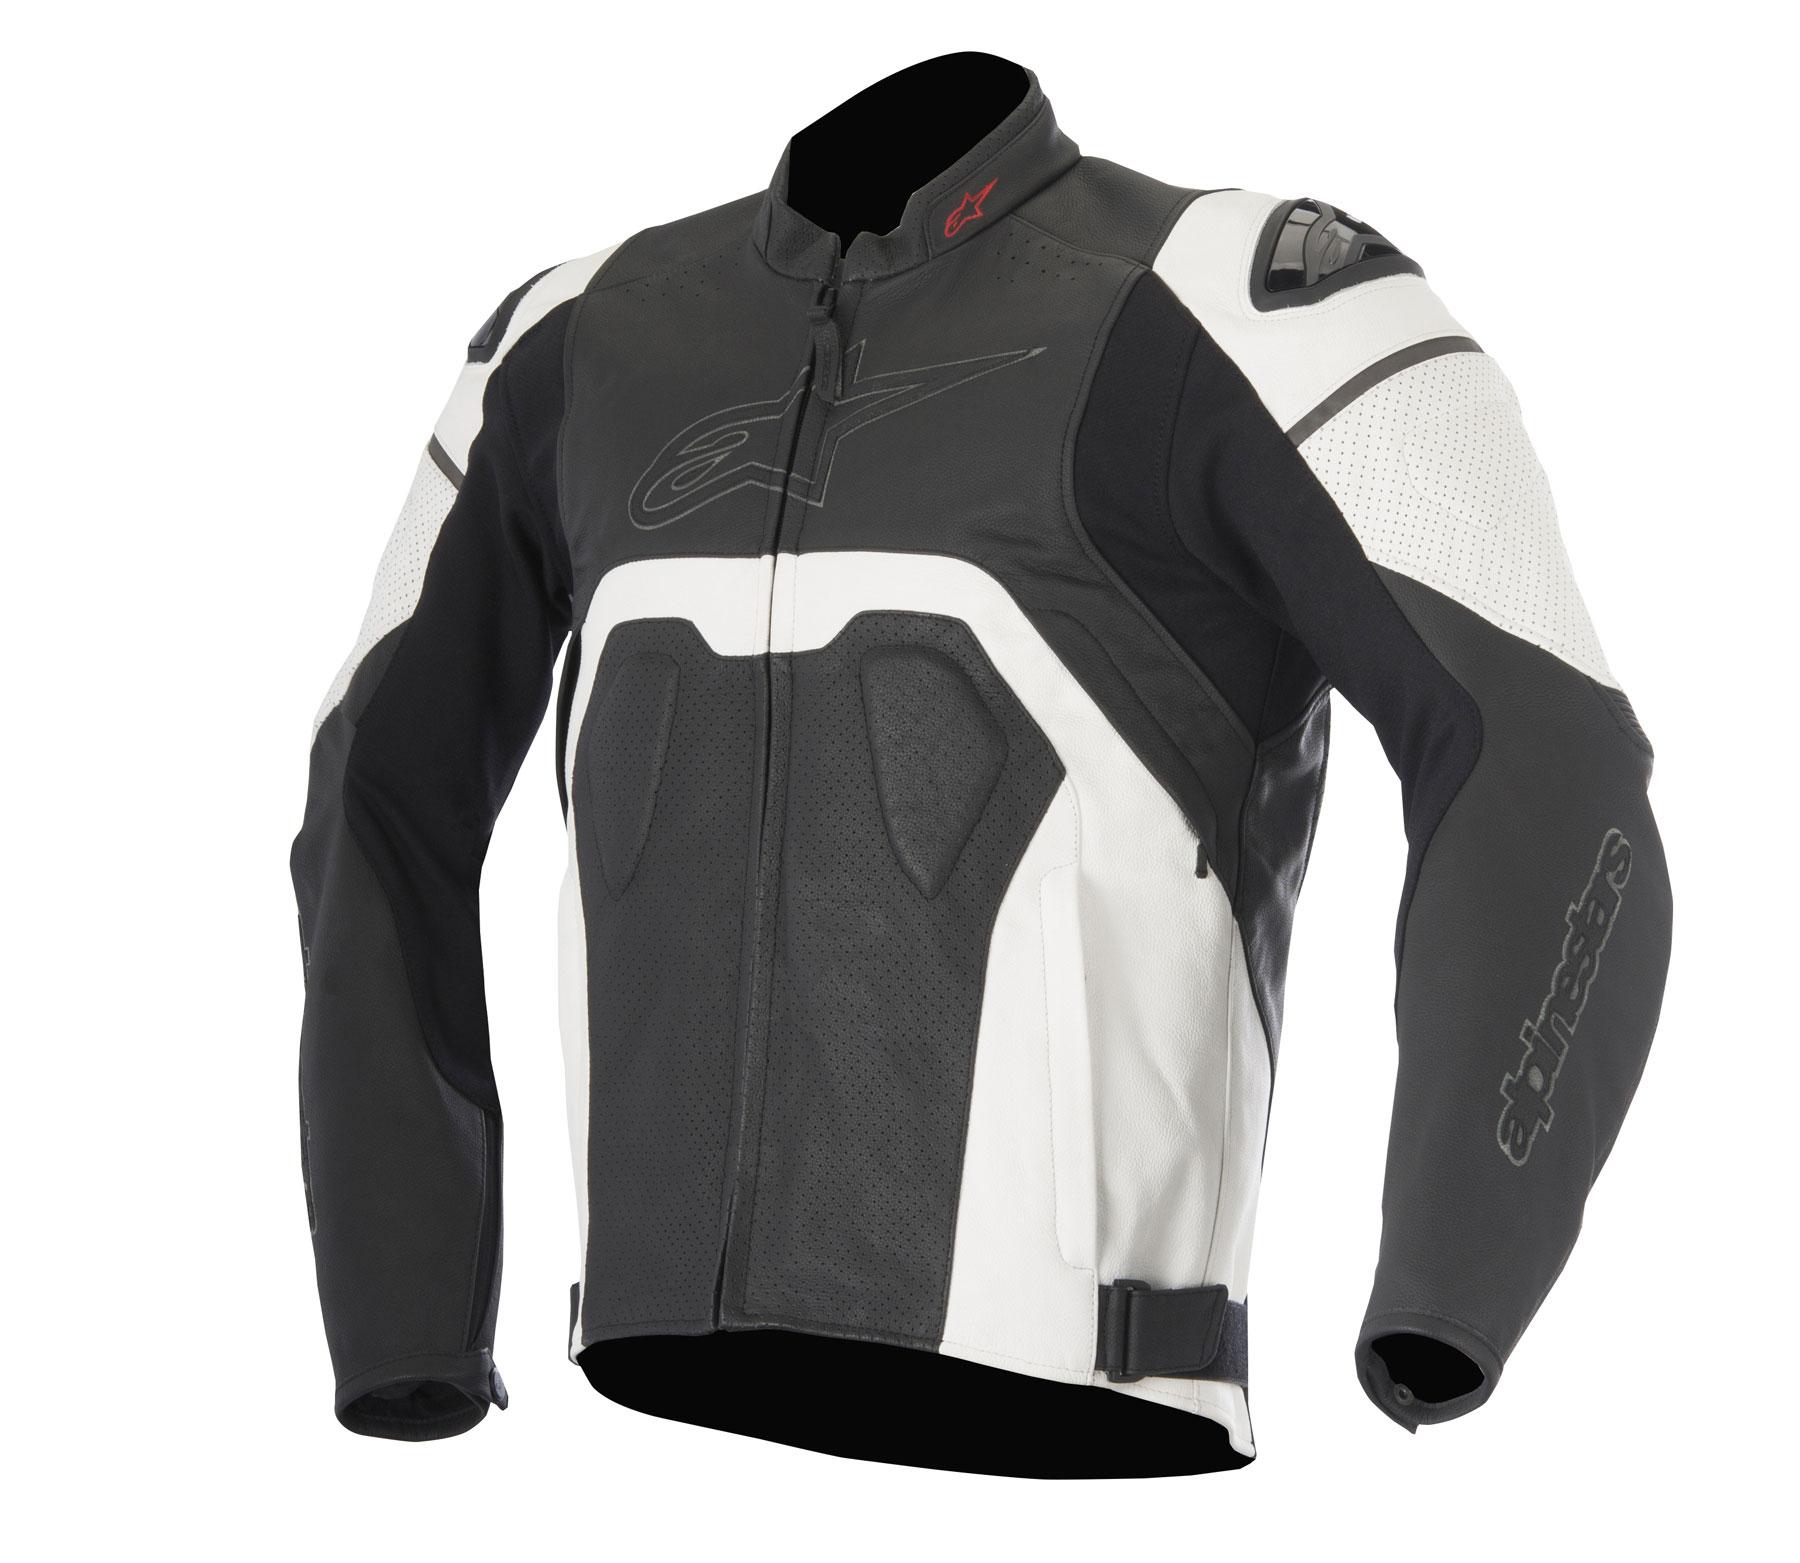 Alpinestars CORE AIRFLOW Leather Jacket (Black/White)